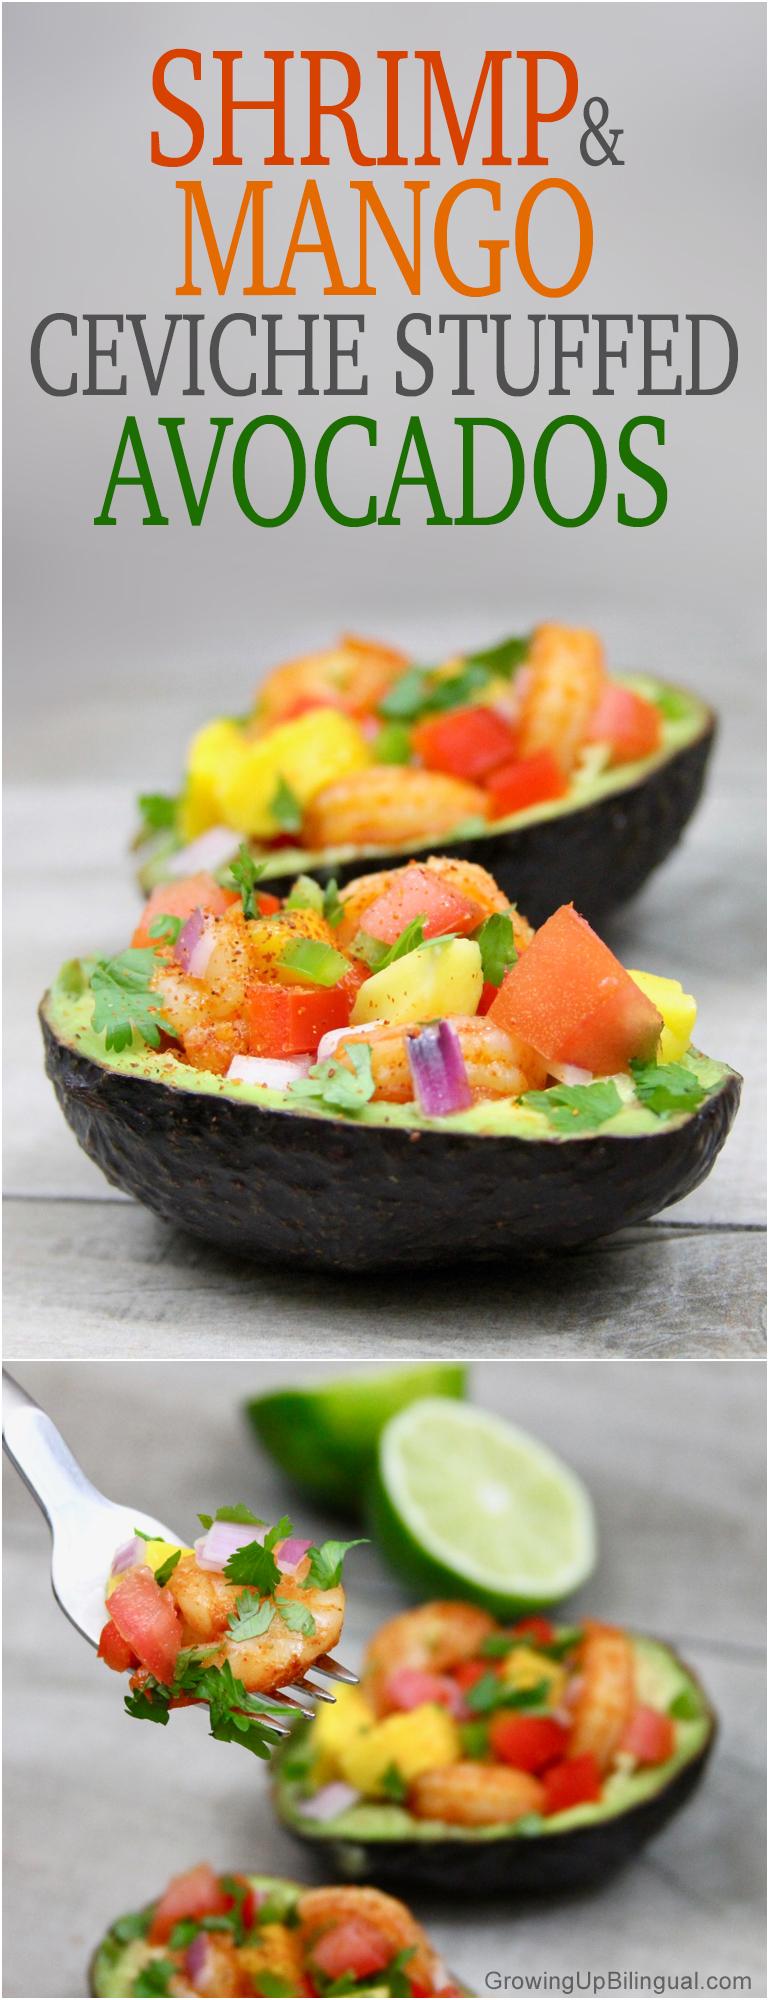 Shrimp and mango ceviche stuffed avocados